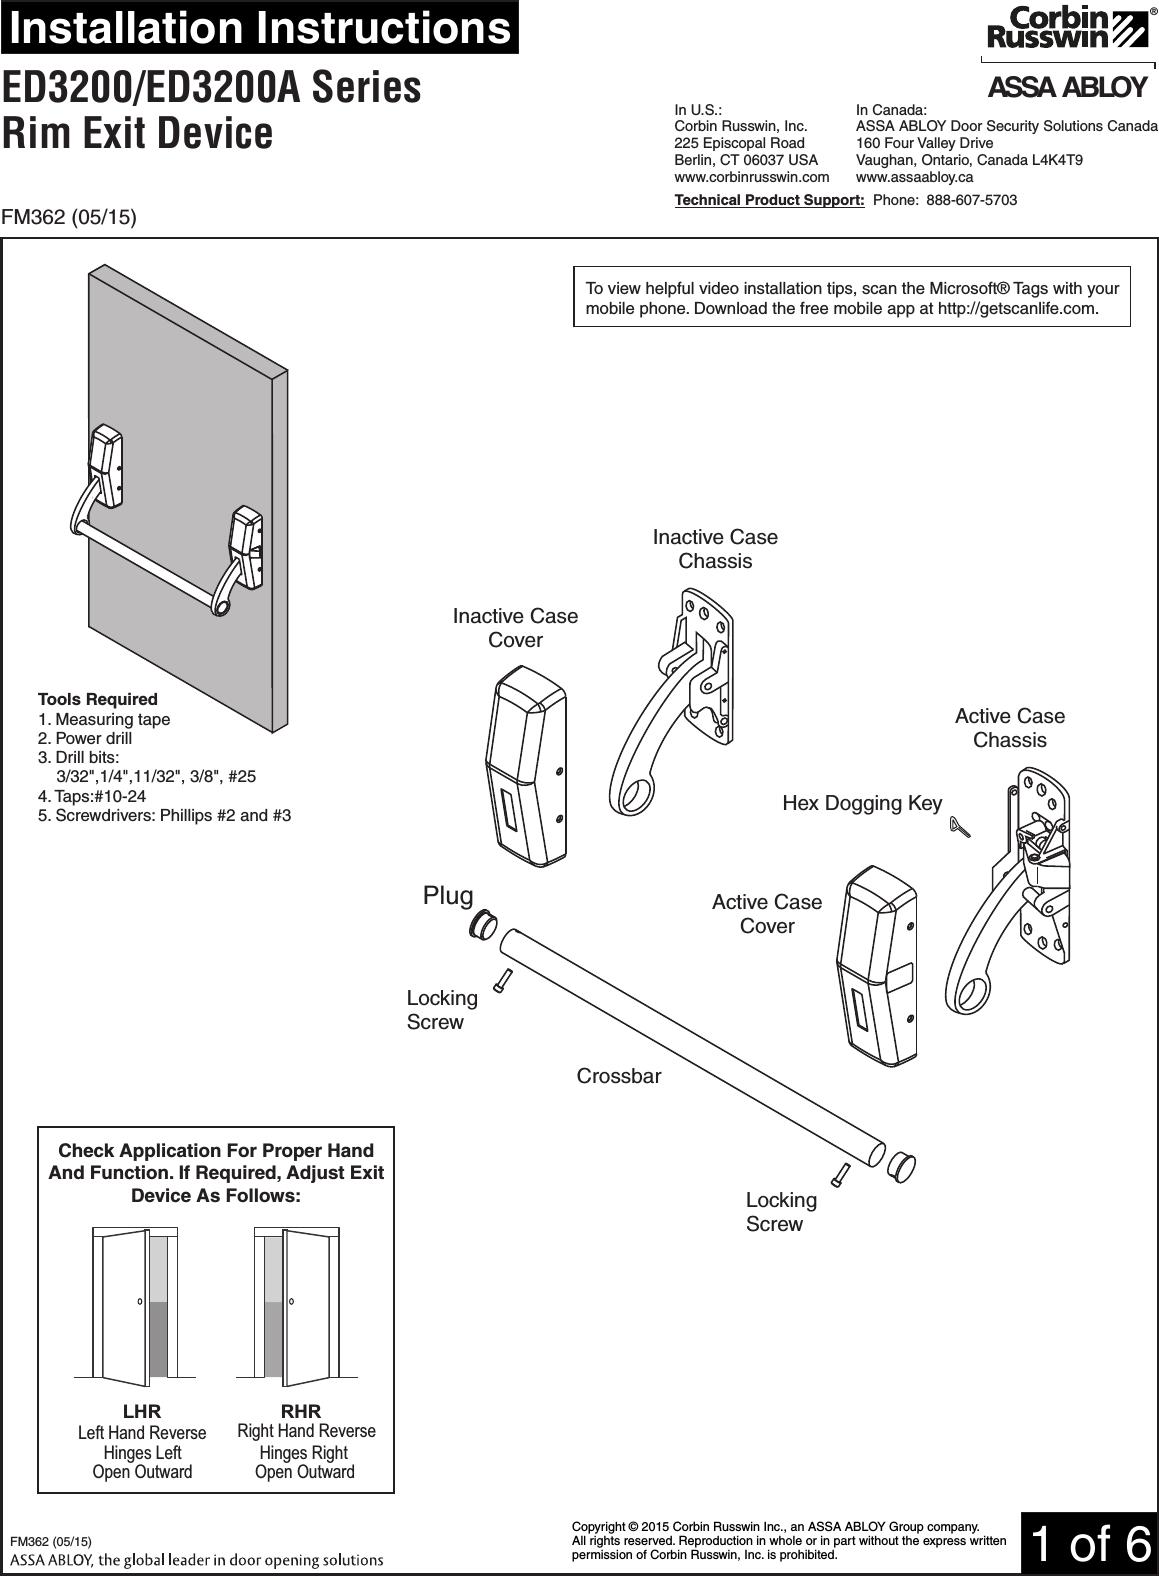 Corbin Russwin Ed Ed A Series Rim Type Exit Device